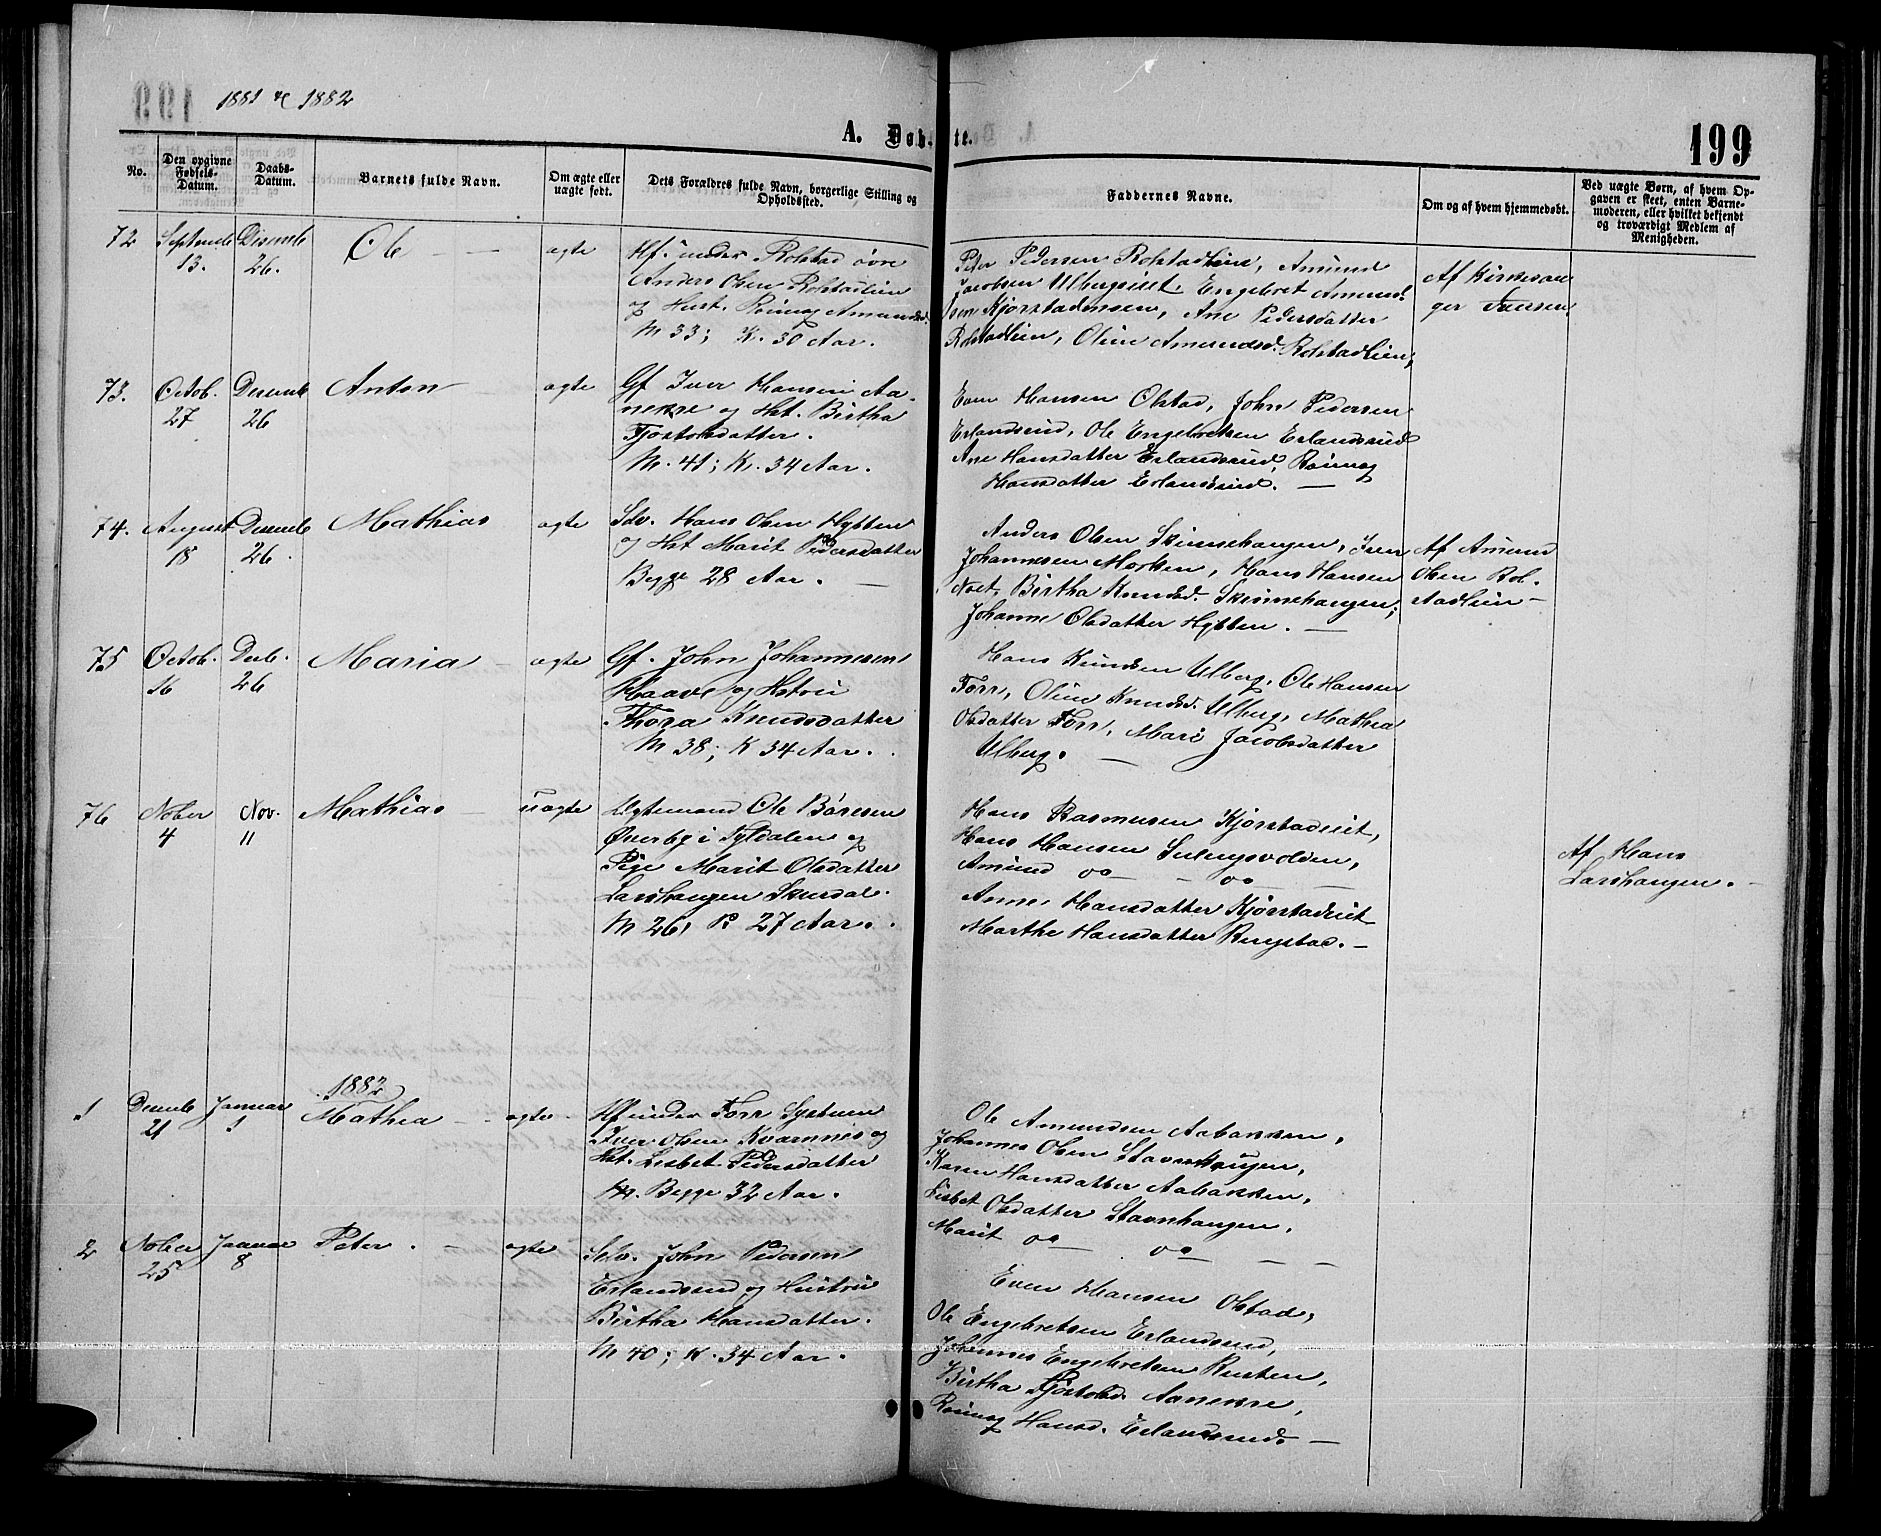 SAH, Sør-Fron prestekontor, H/Ha/Hab/L0002: Klokkerbok nr. 2, 1864-1883, s. 199